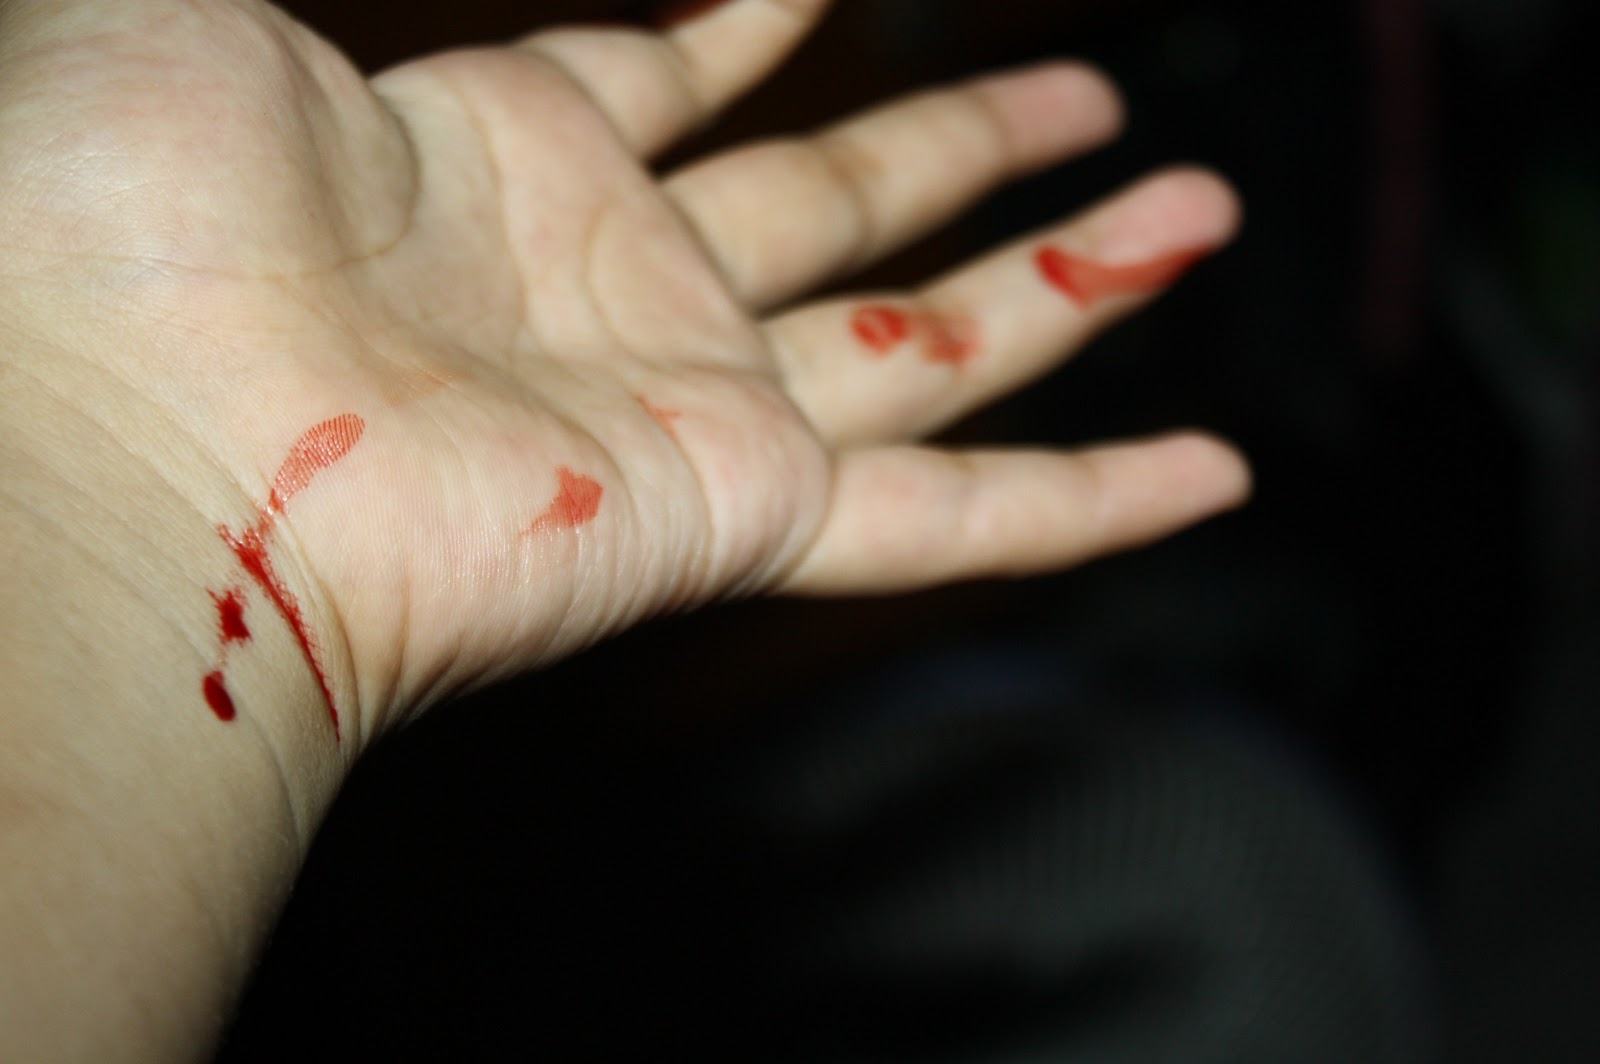 Luka Sayat Gambar Tangan Berdarah Di Iris Silet